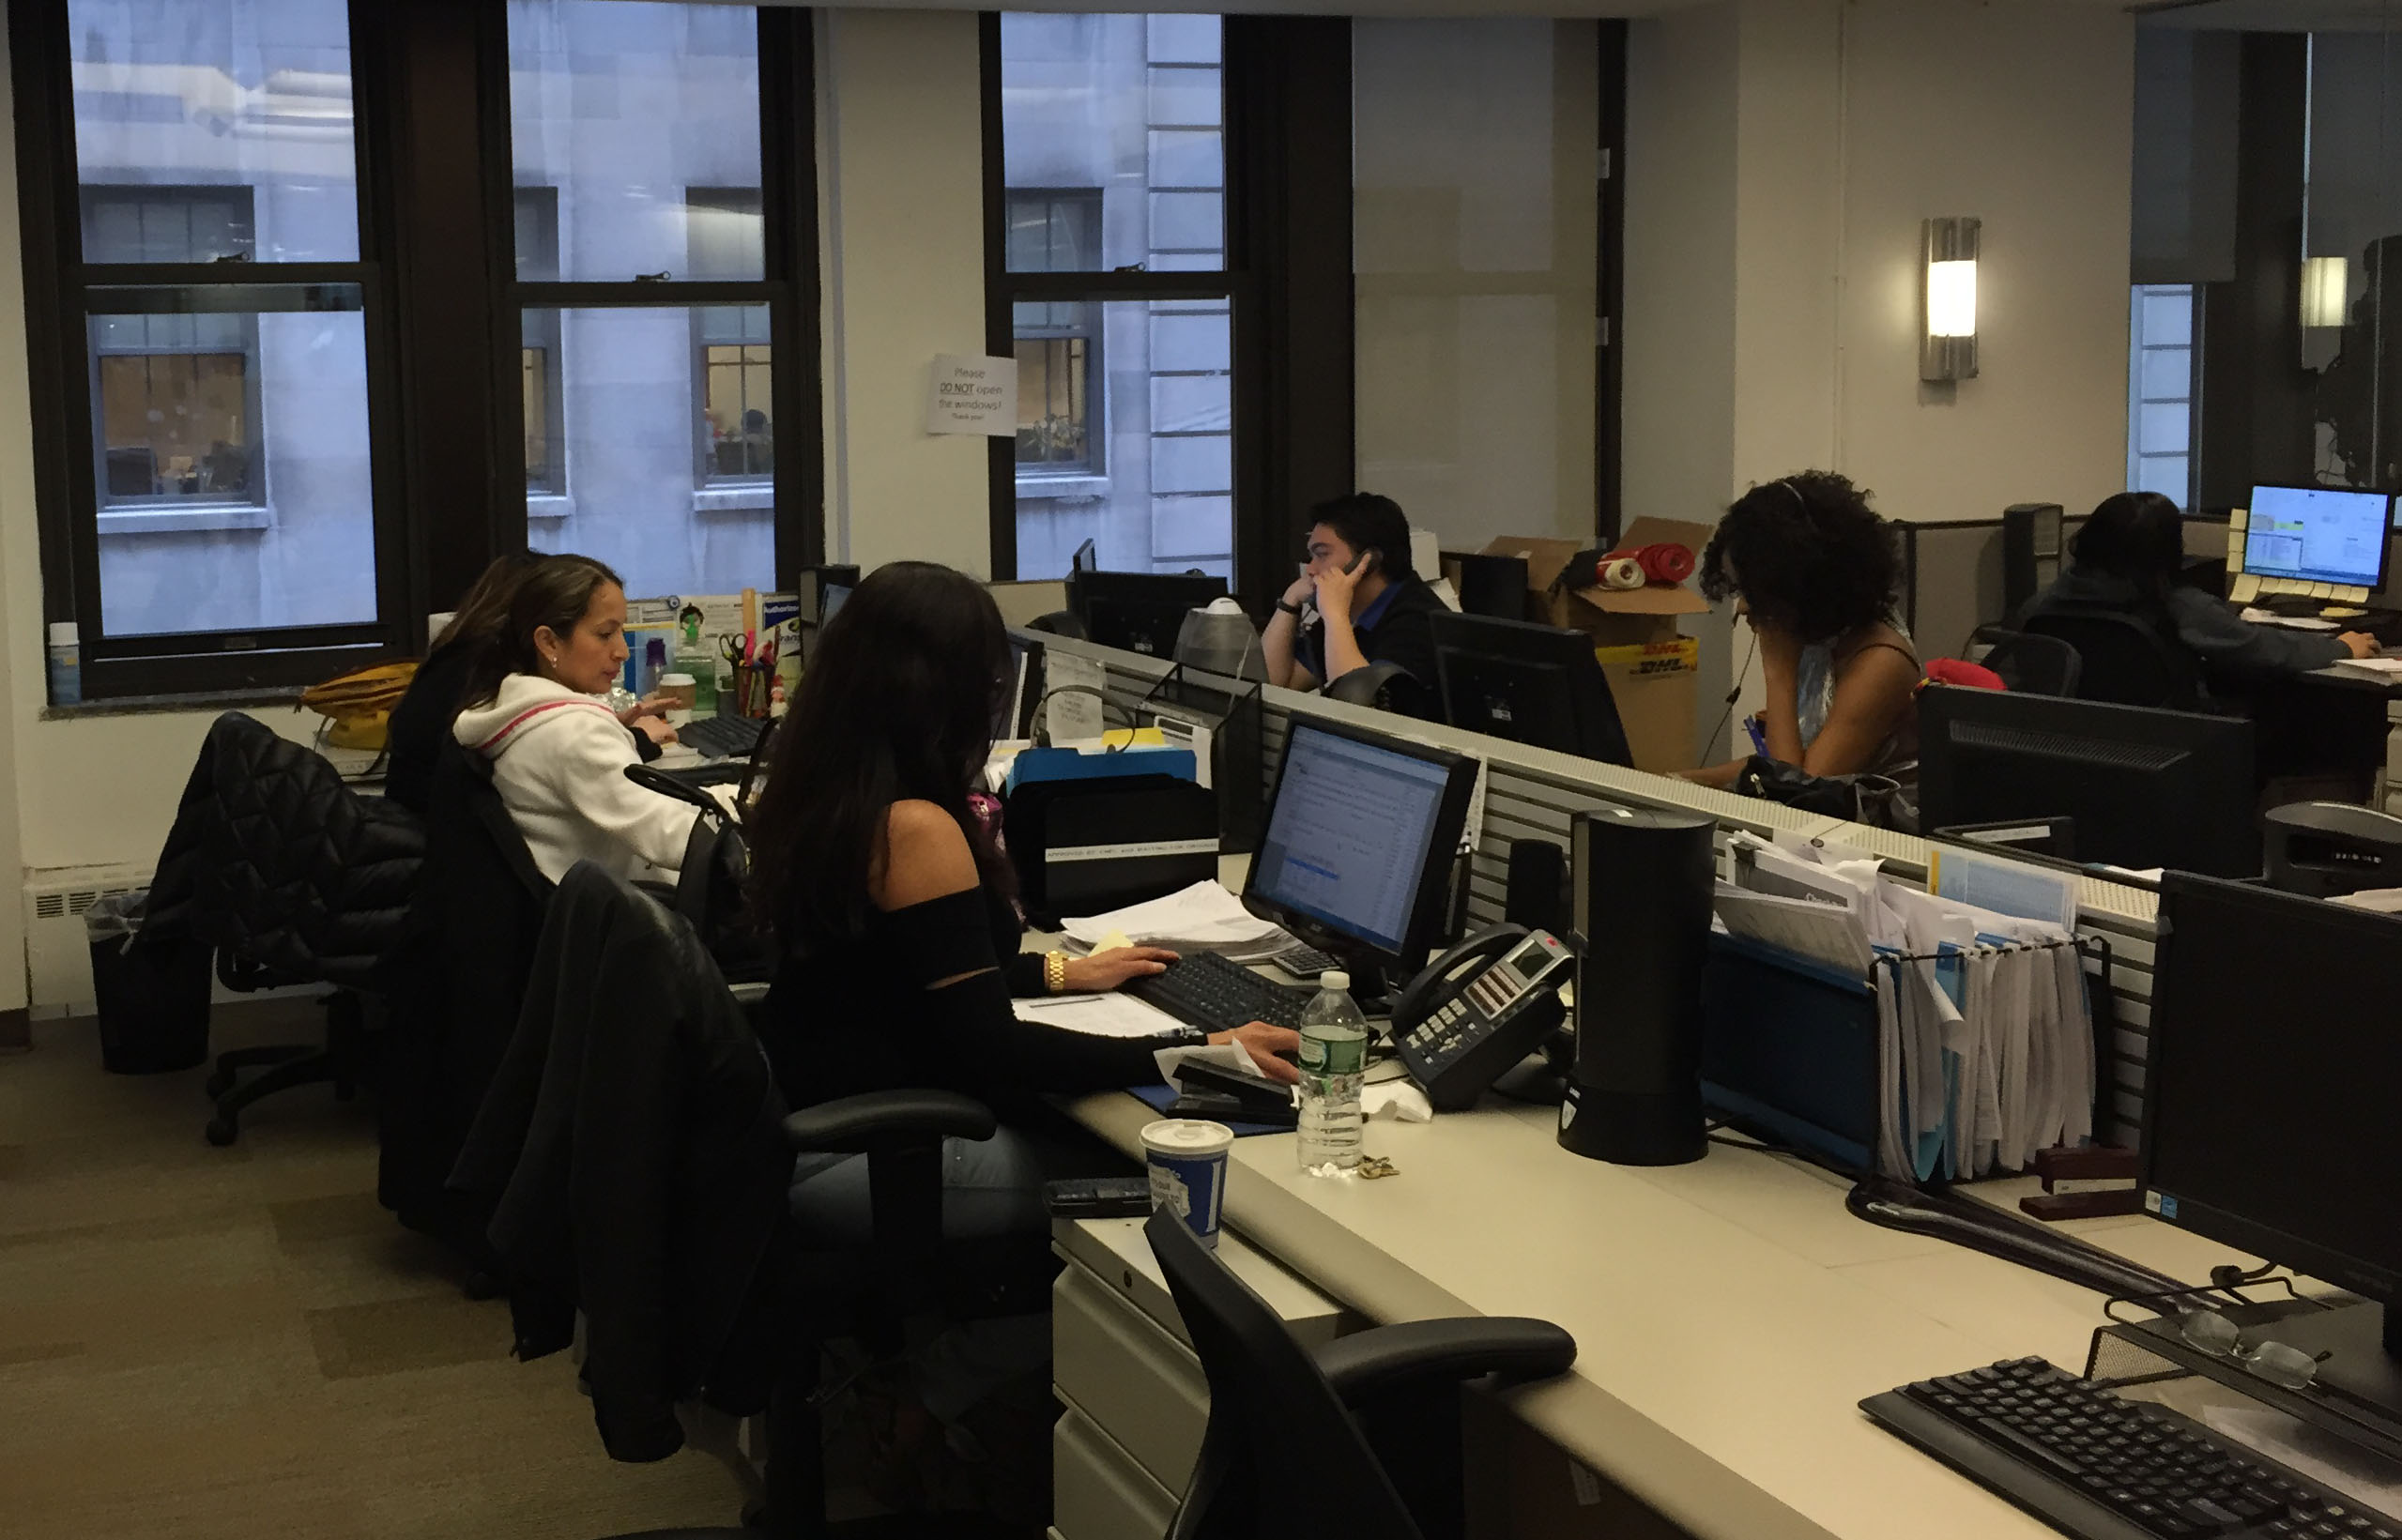 Transfast Working Environment Money Transfer Global Hq On 44 Wall Street New York